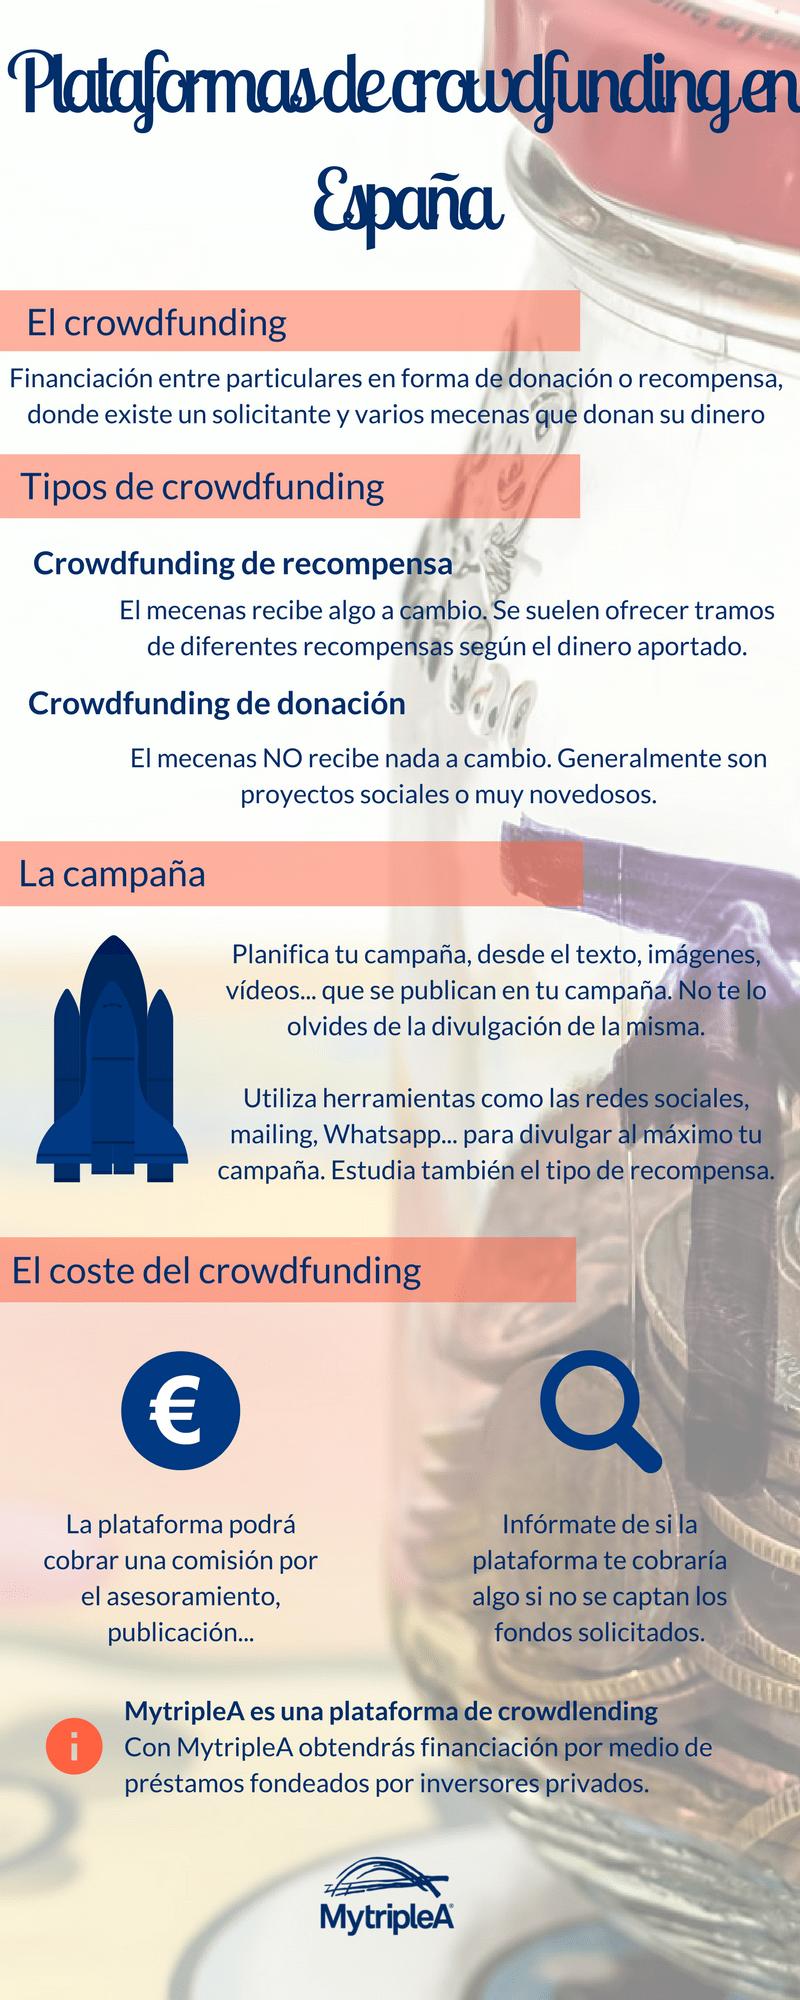 Plataformas crowdfunding España